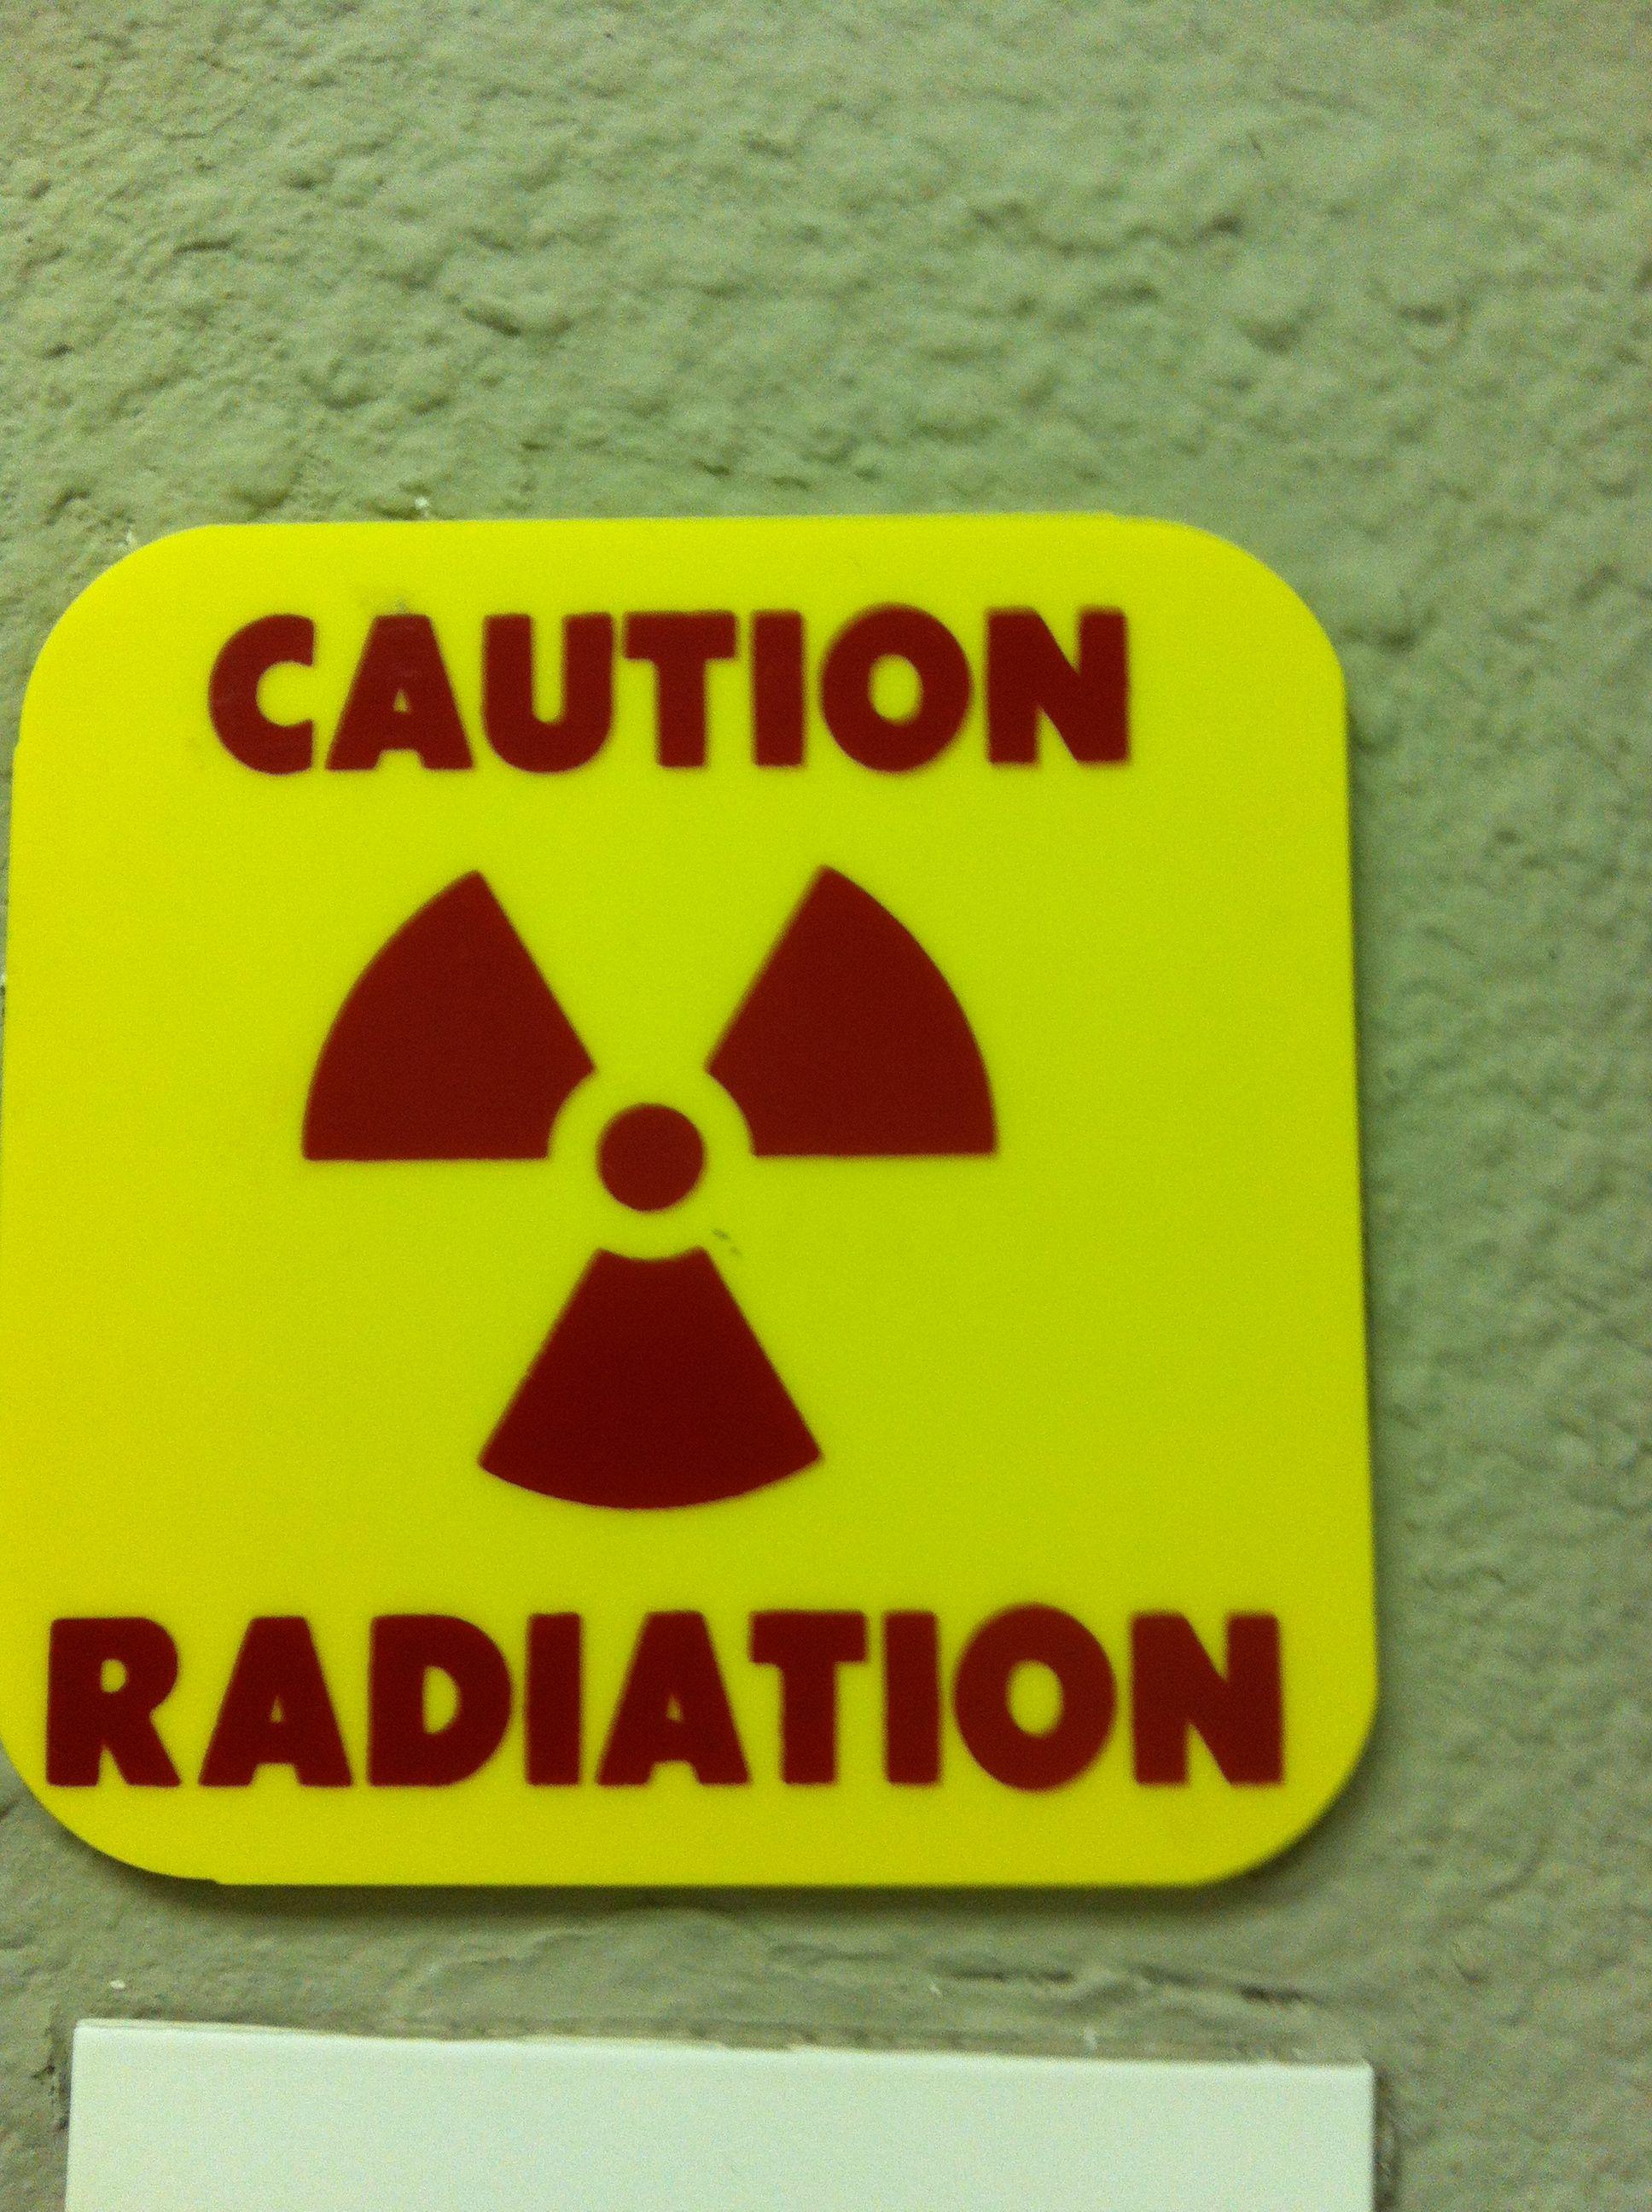 Caution Radiation sign Dental